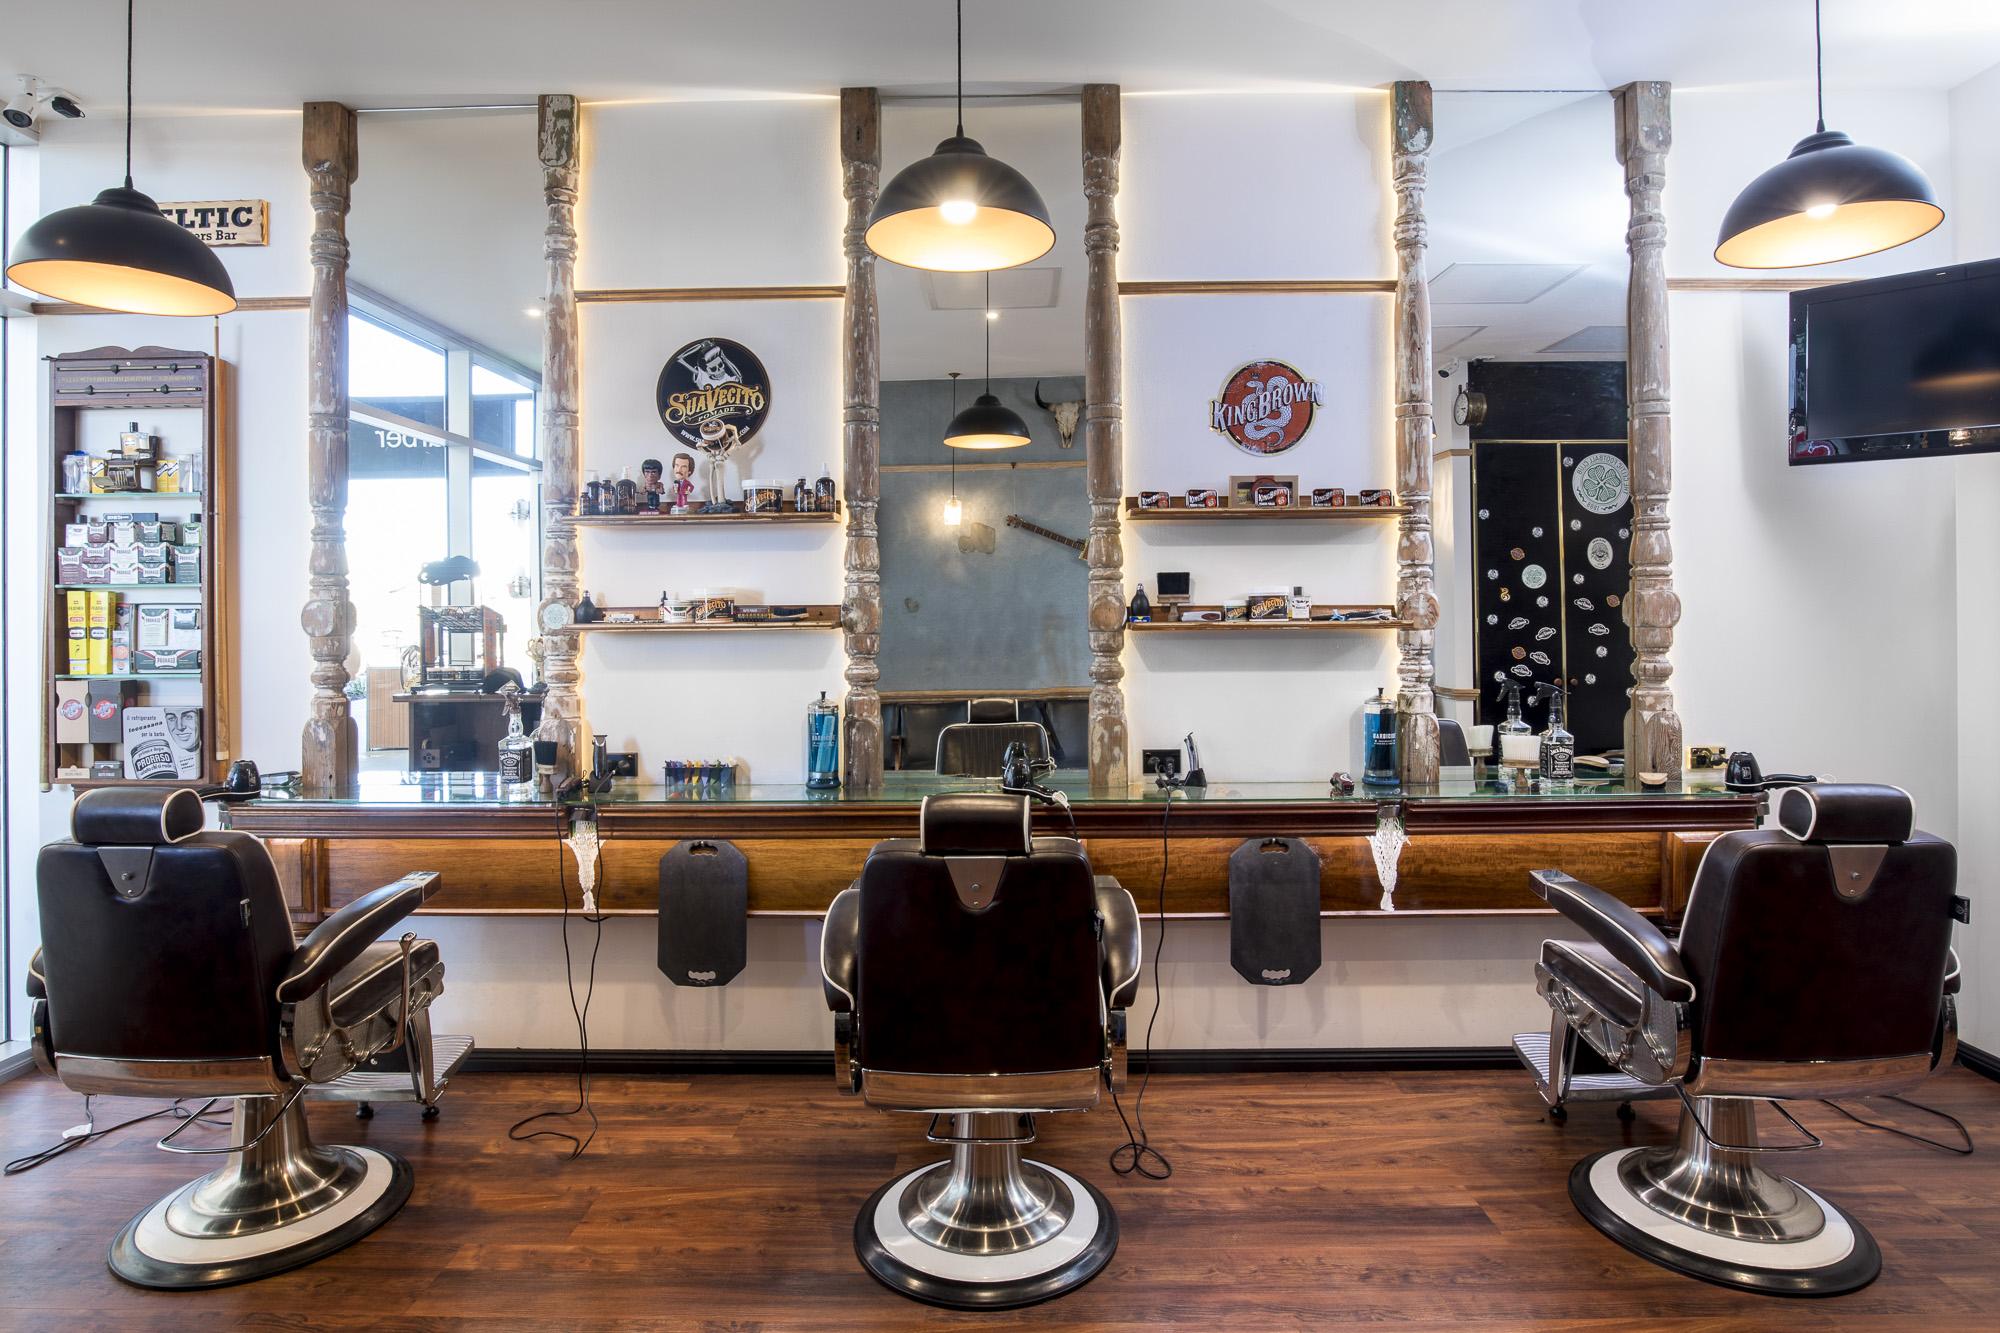 balanced-earth-barber-shop-2.jpg